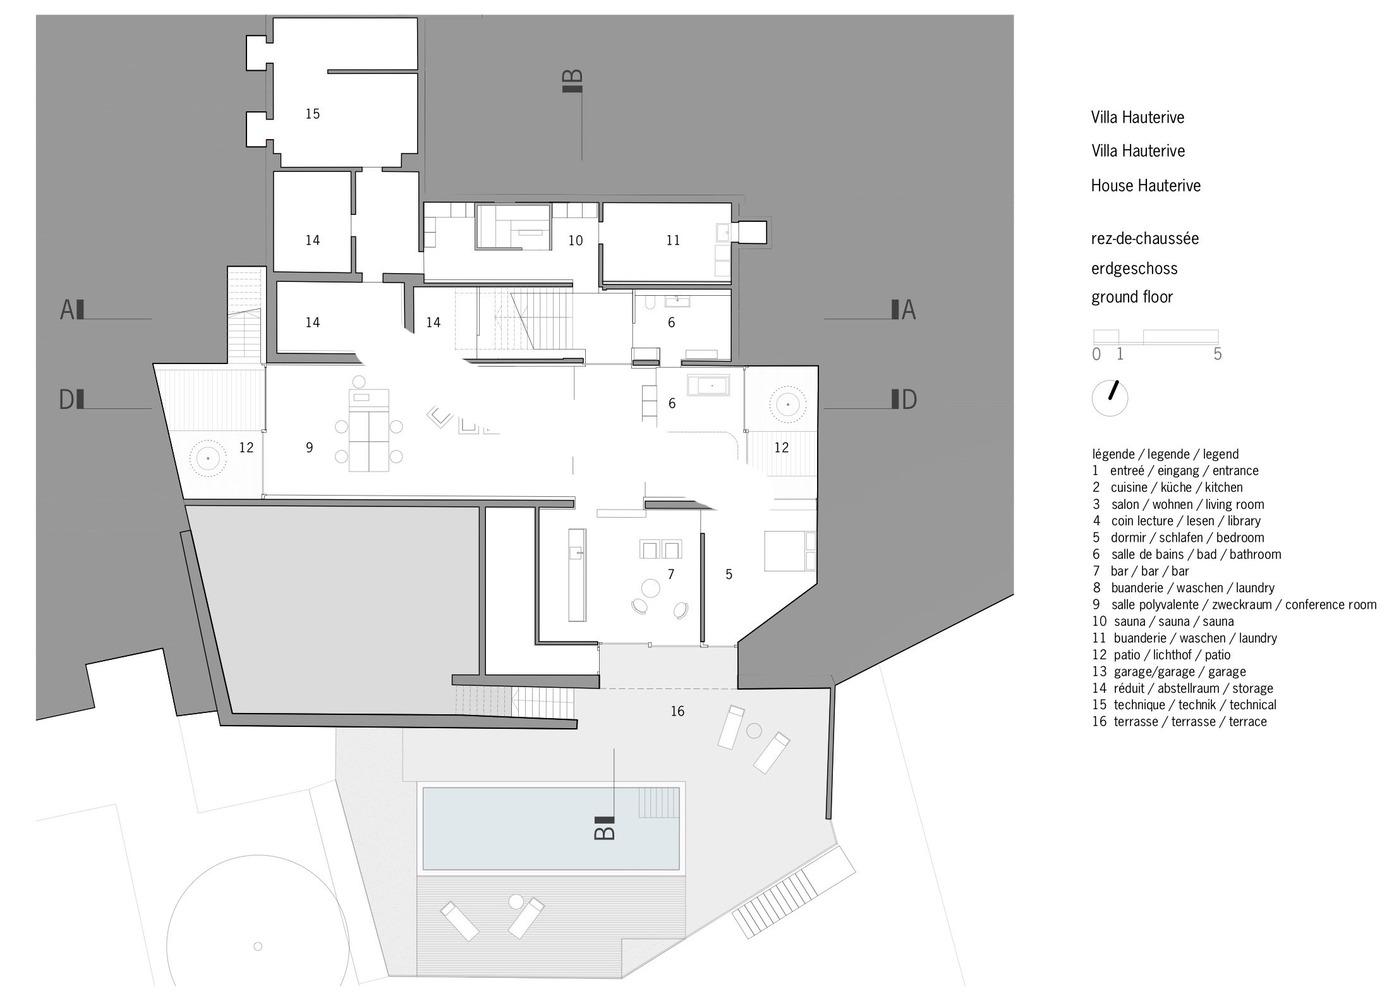 Salle De Bain Buanderie Plan